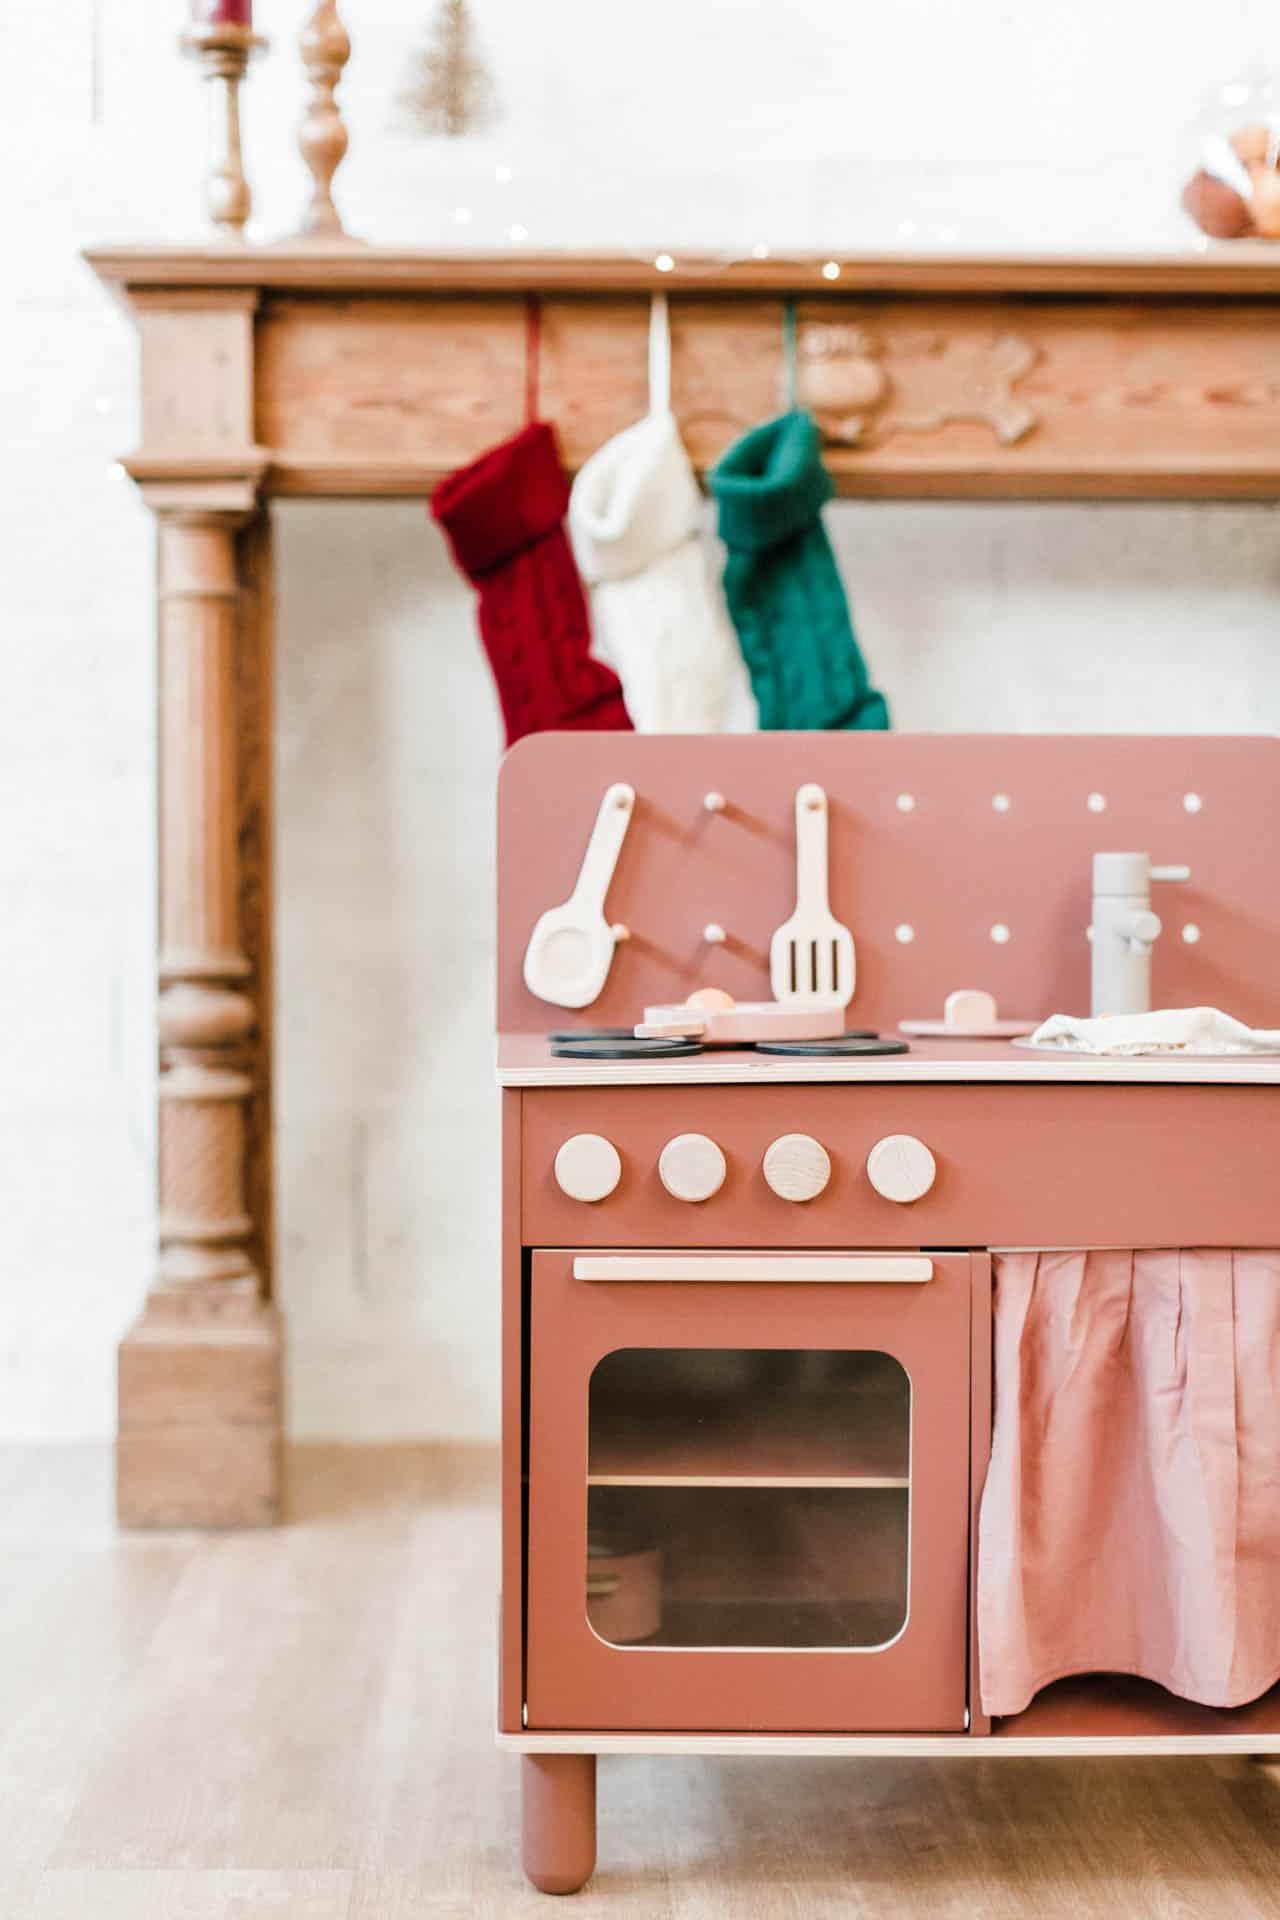 cuisine-en-bois-design-vintage-rose-fonce-marque-flexa